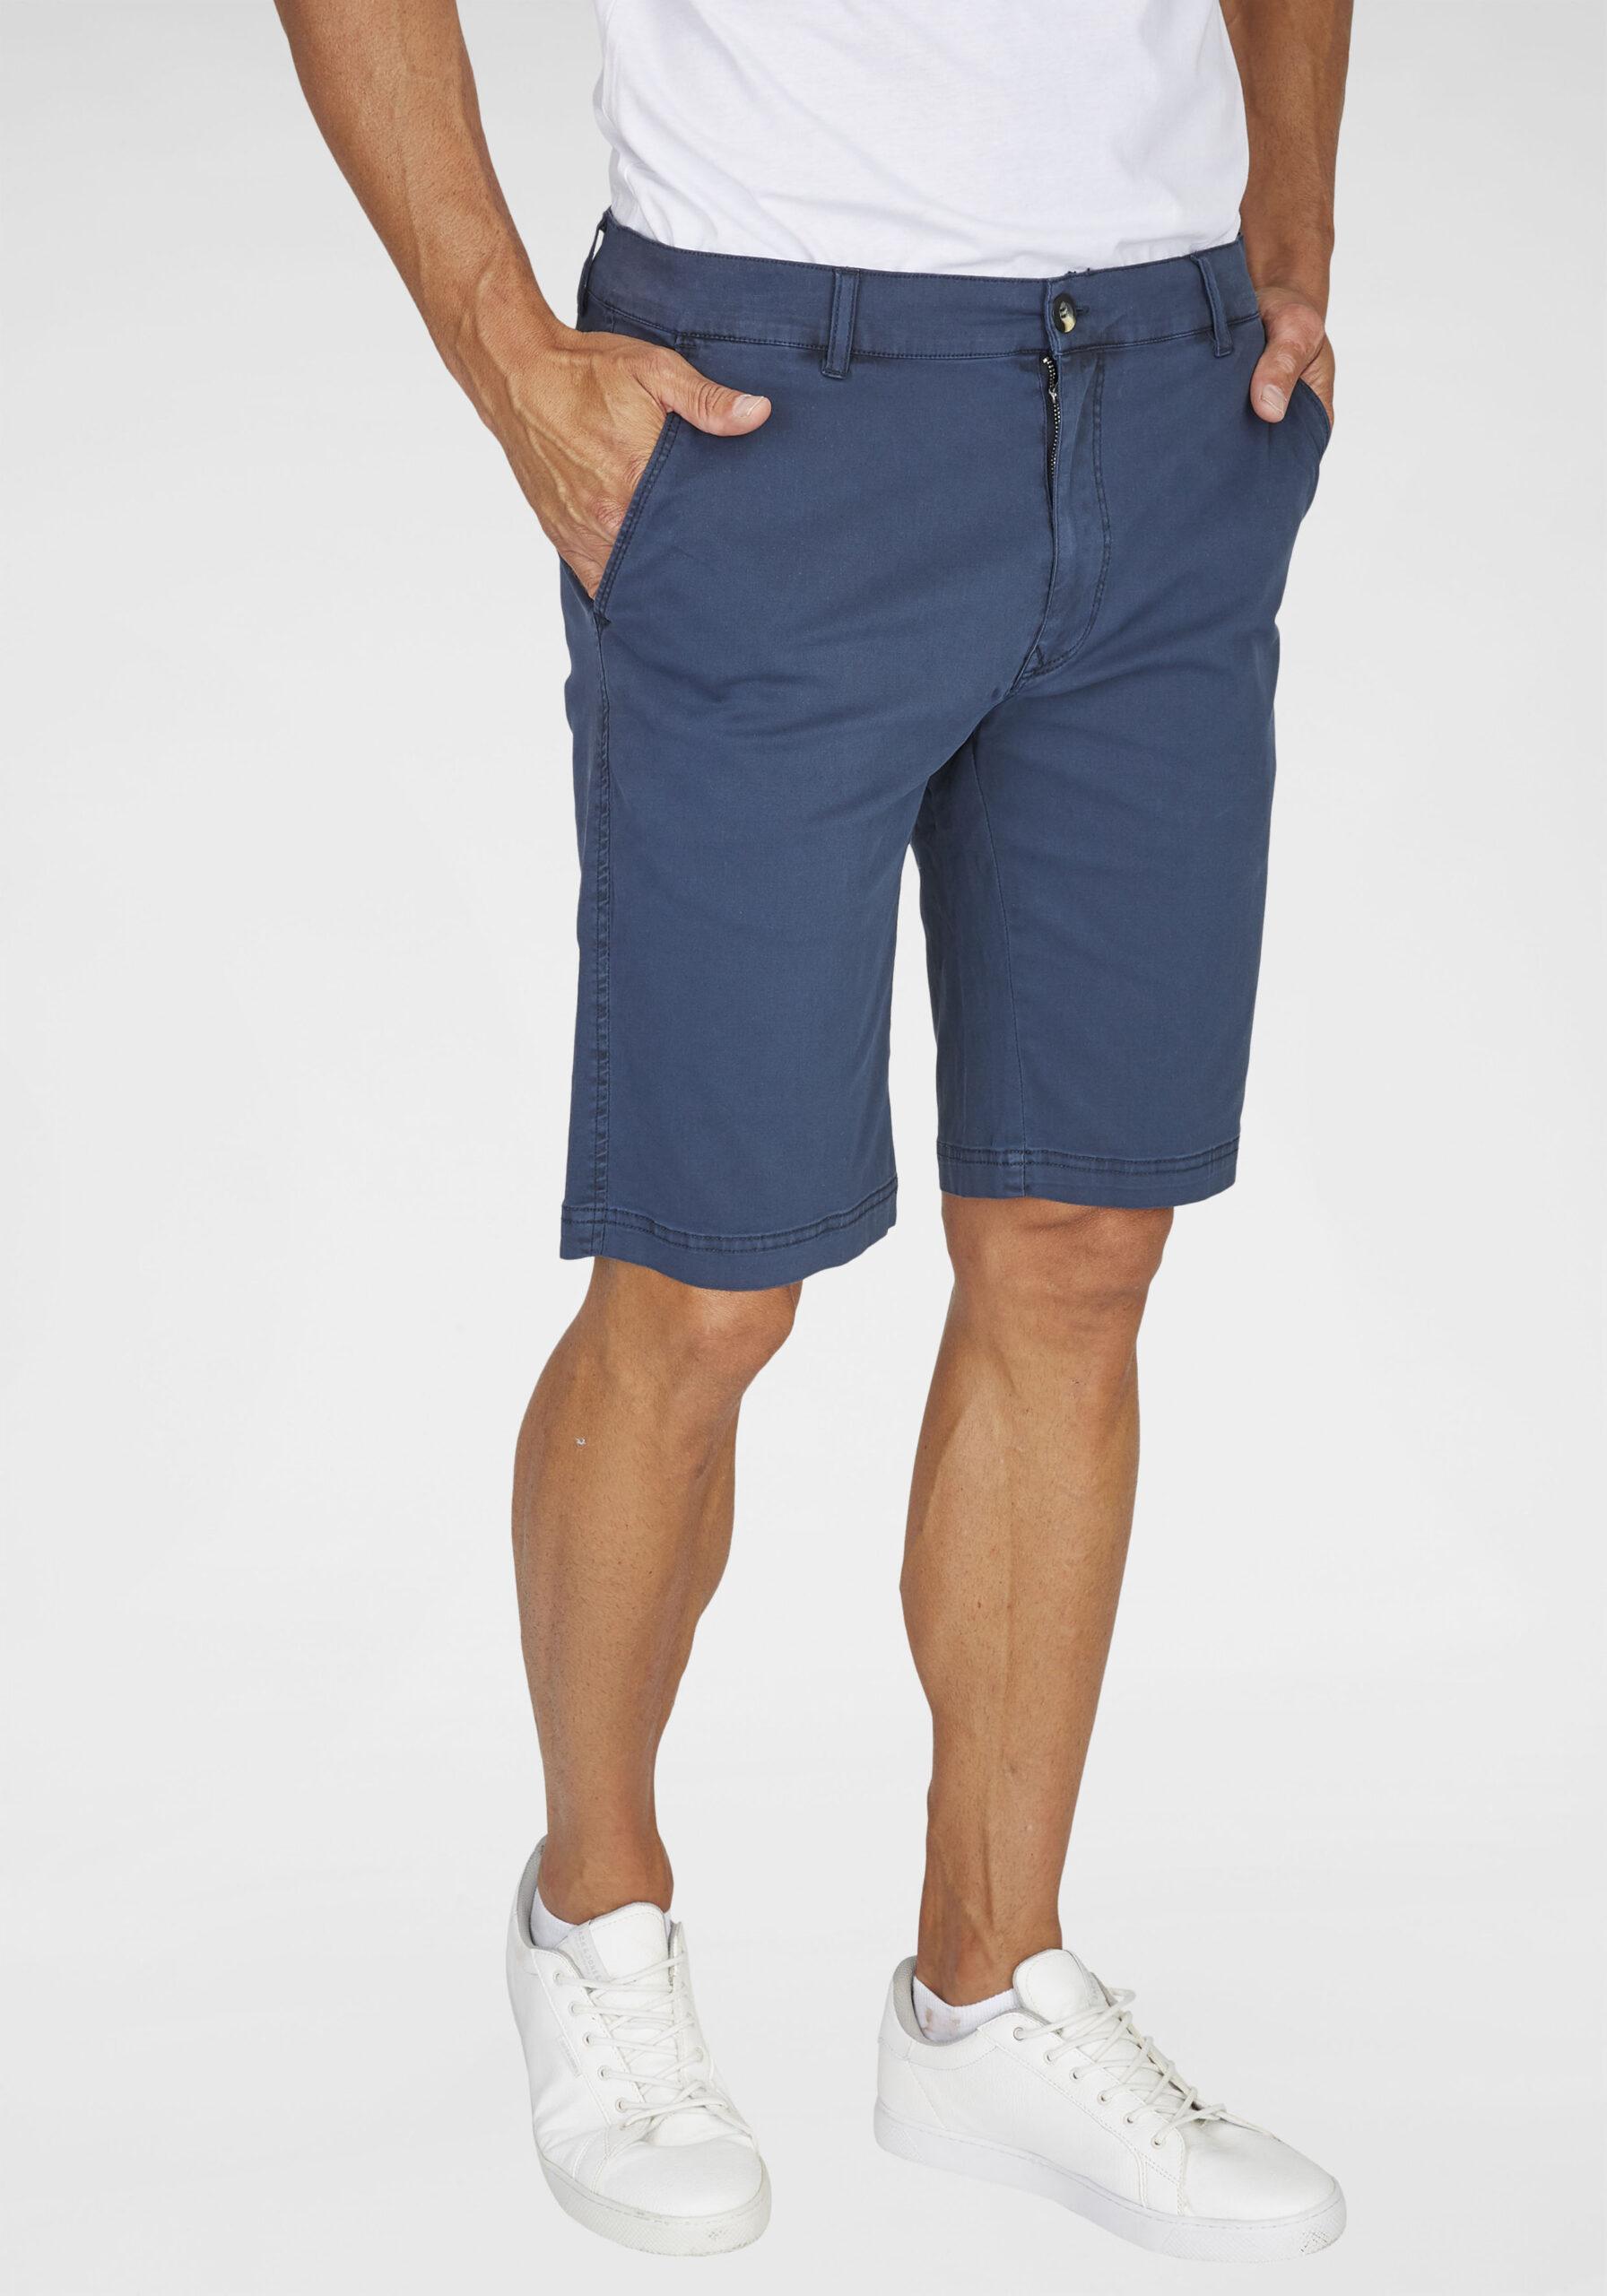 Herren Elegante Bermudahose blau